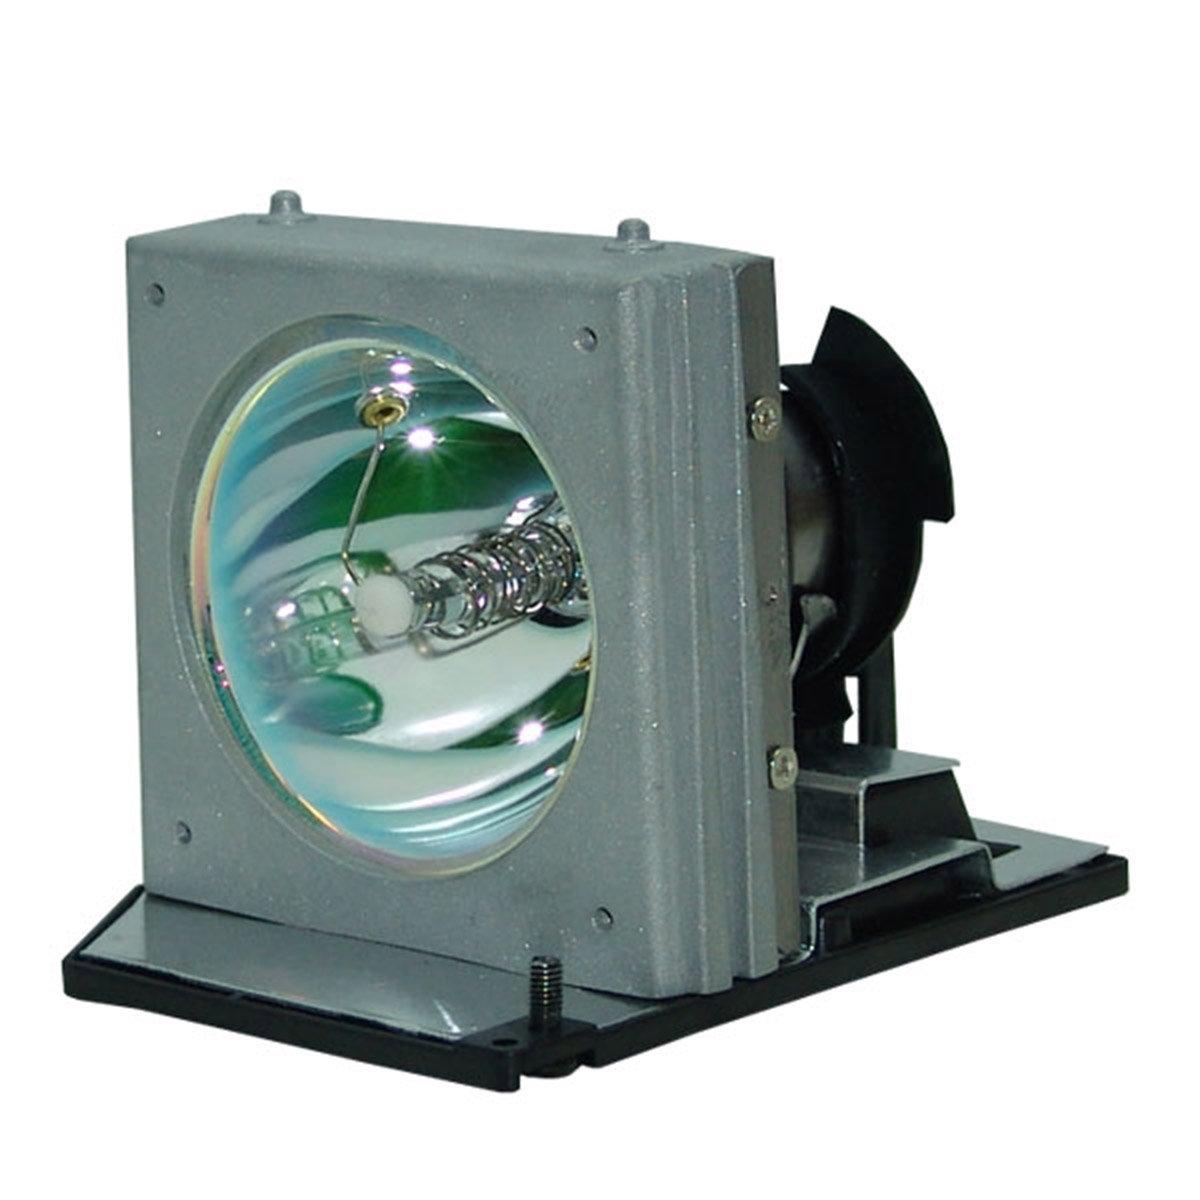 Lutema OEM プロジェクター交換用ランプ ハウジング/電球付き Optoma HD70用 Economy Economy Lamp with Housing B07KTLP5CK